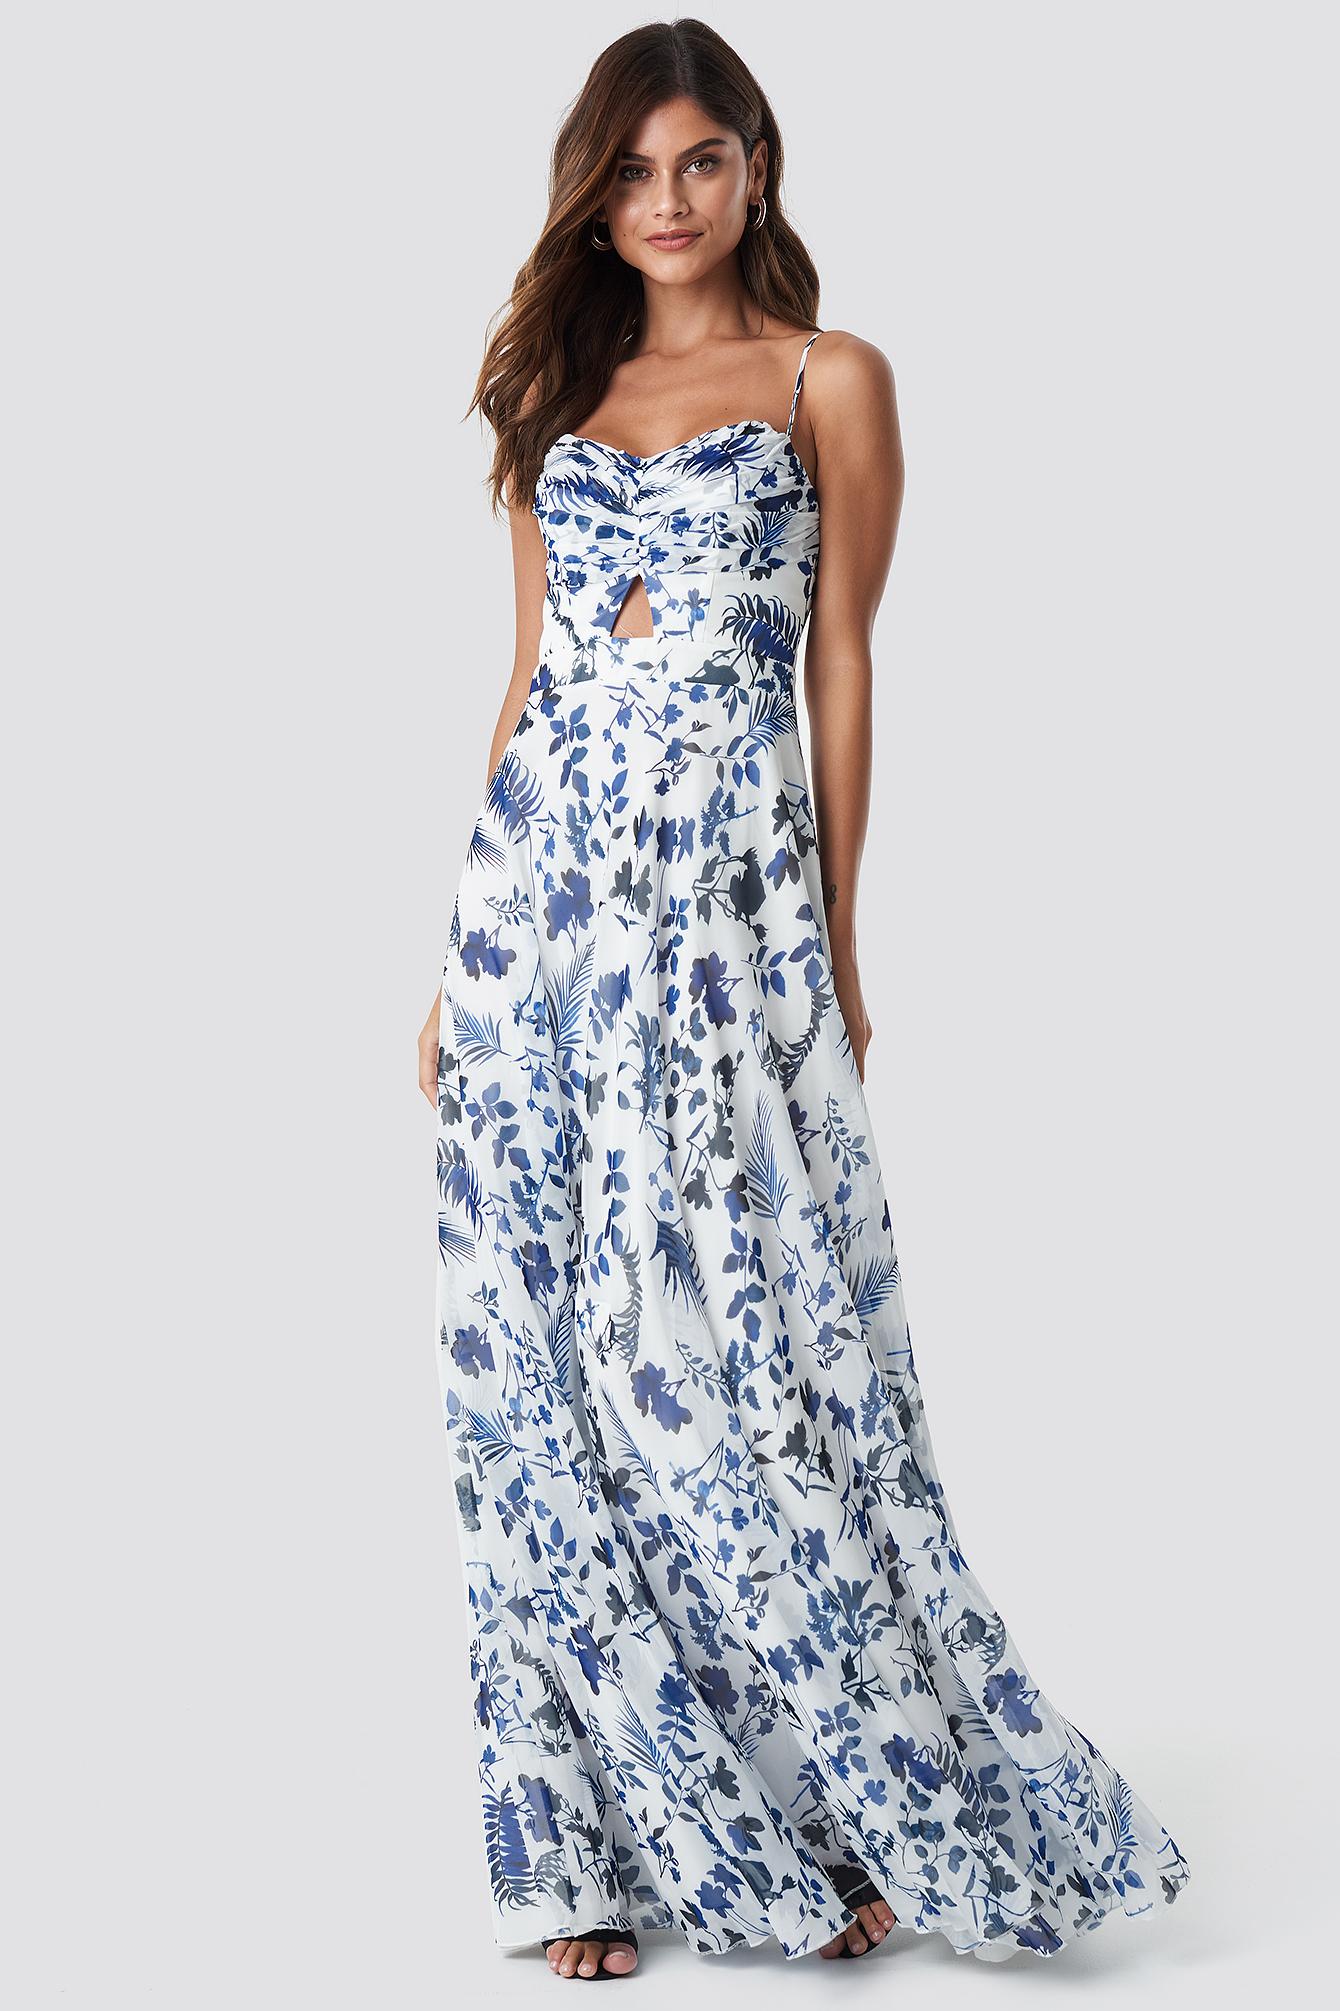 TRENDYOL FLOWER PATTERN MAXI DRESS - WHITE, MULTICOLOR